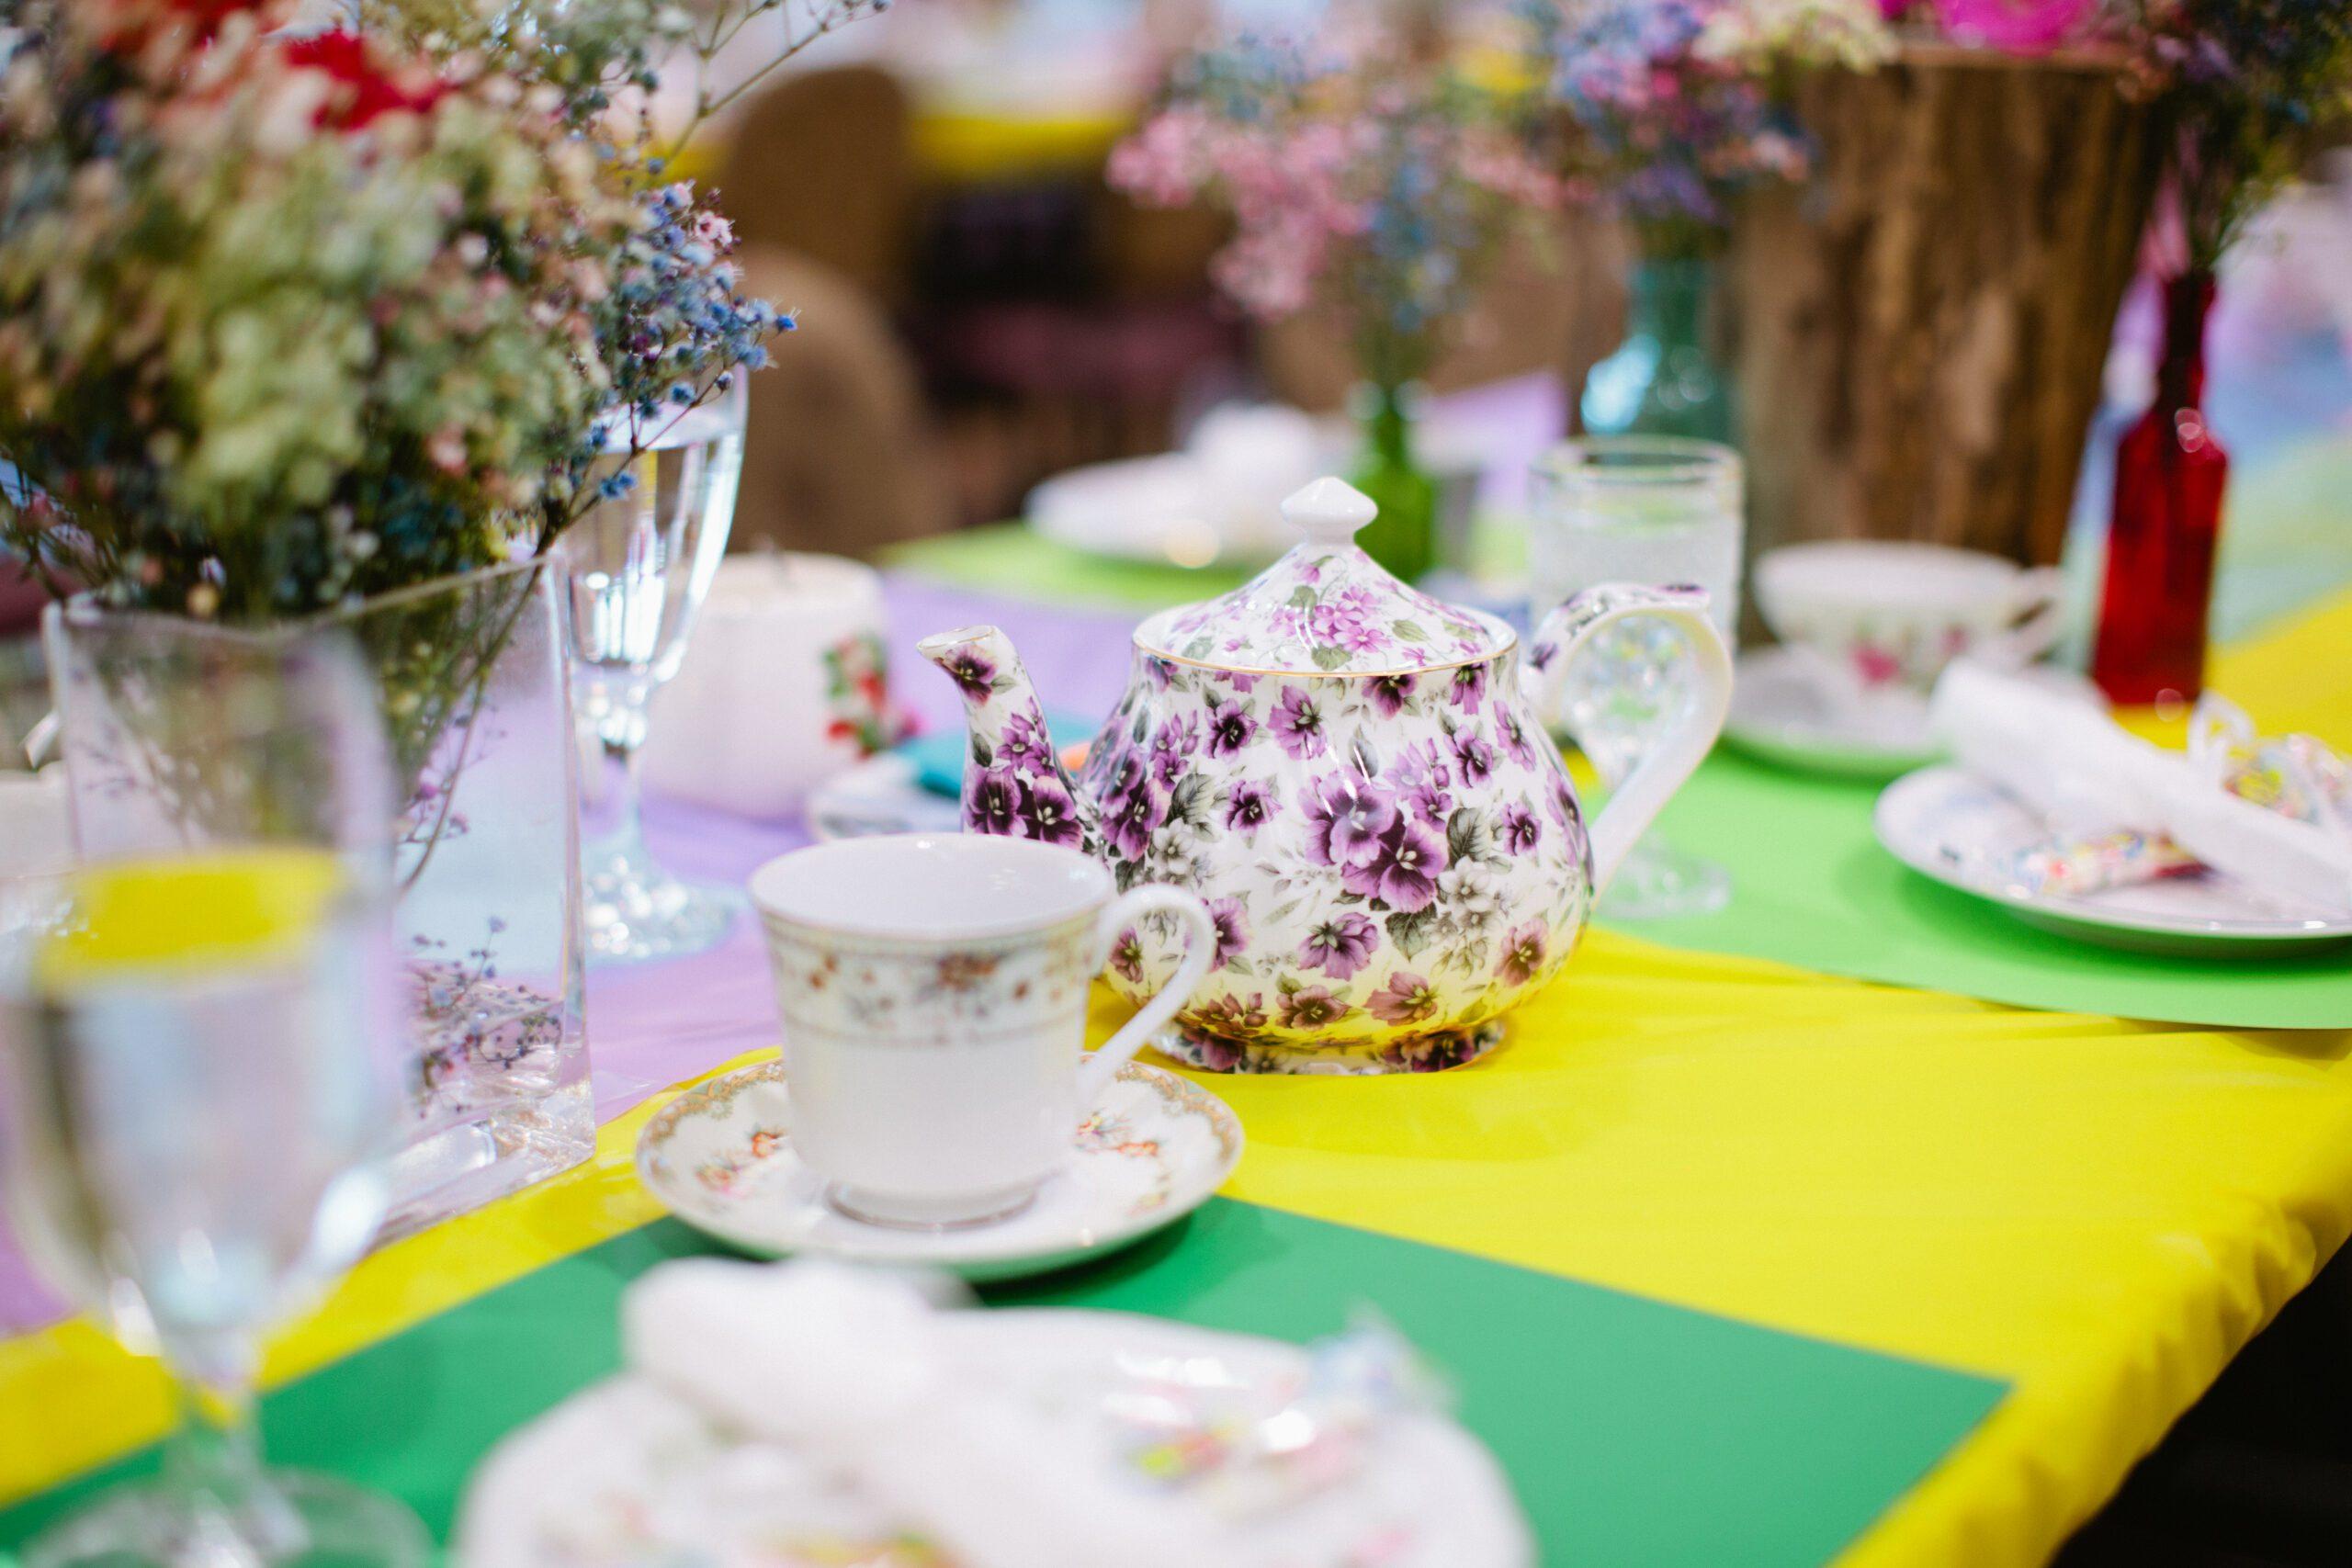 Mother Daughter Tea Party: Memories that last a lifetime